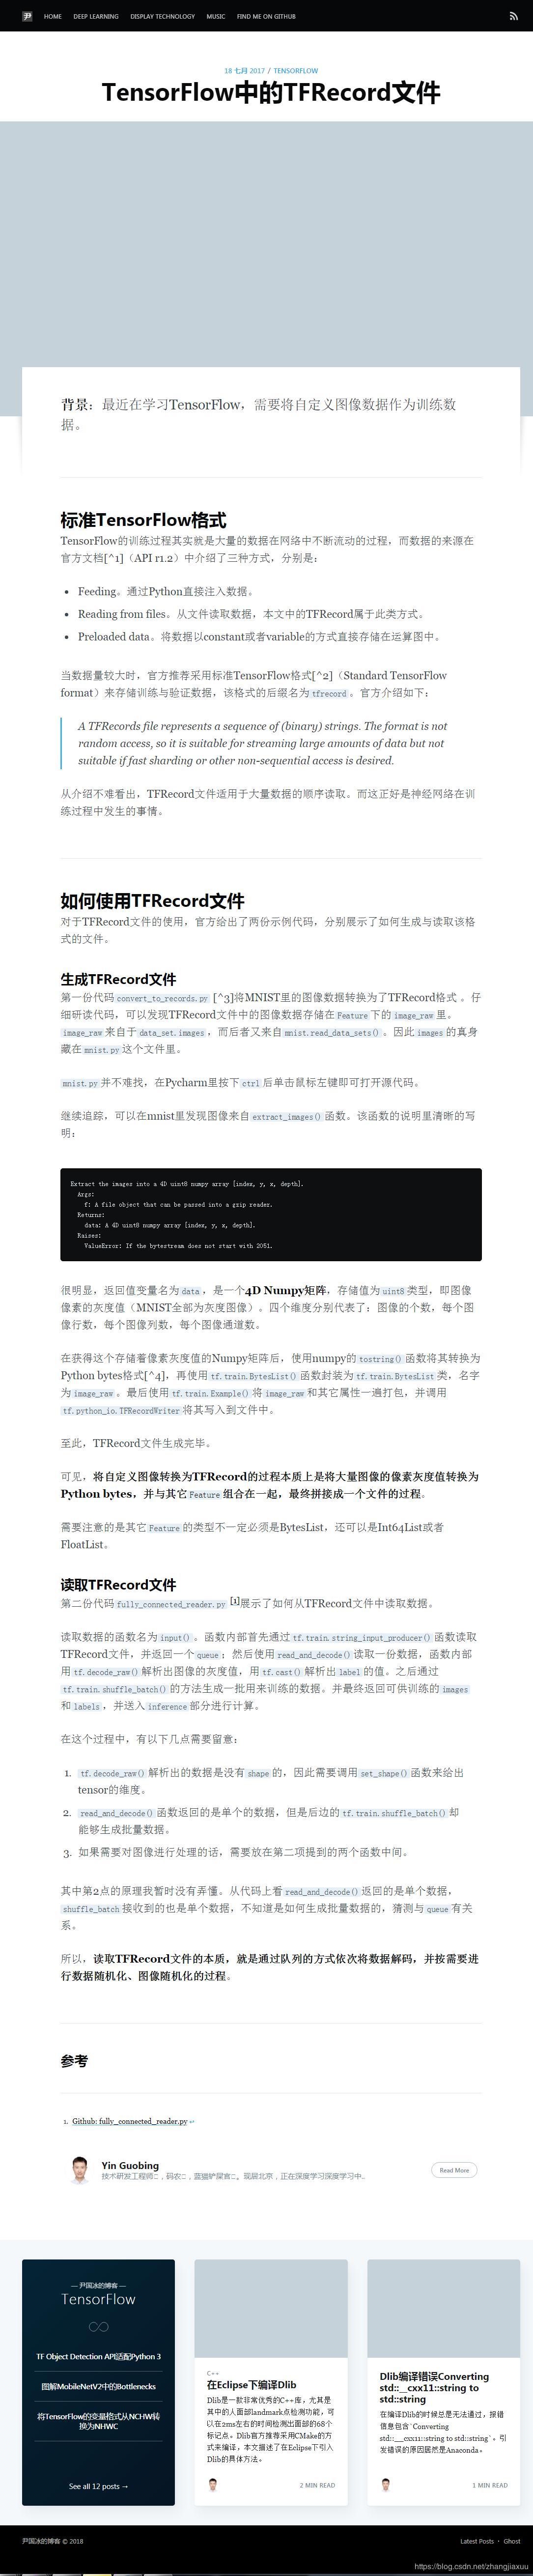 TFRecord file in TensorFlow - Programmer Sought